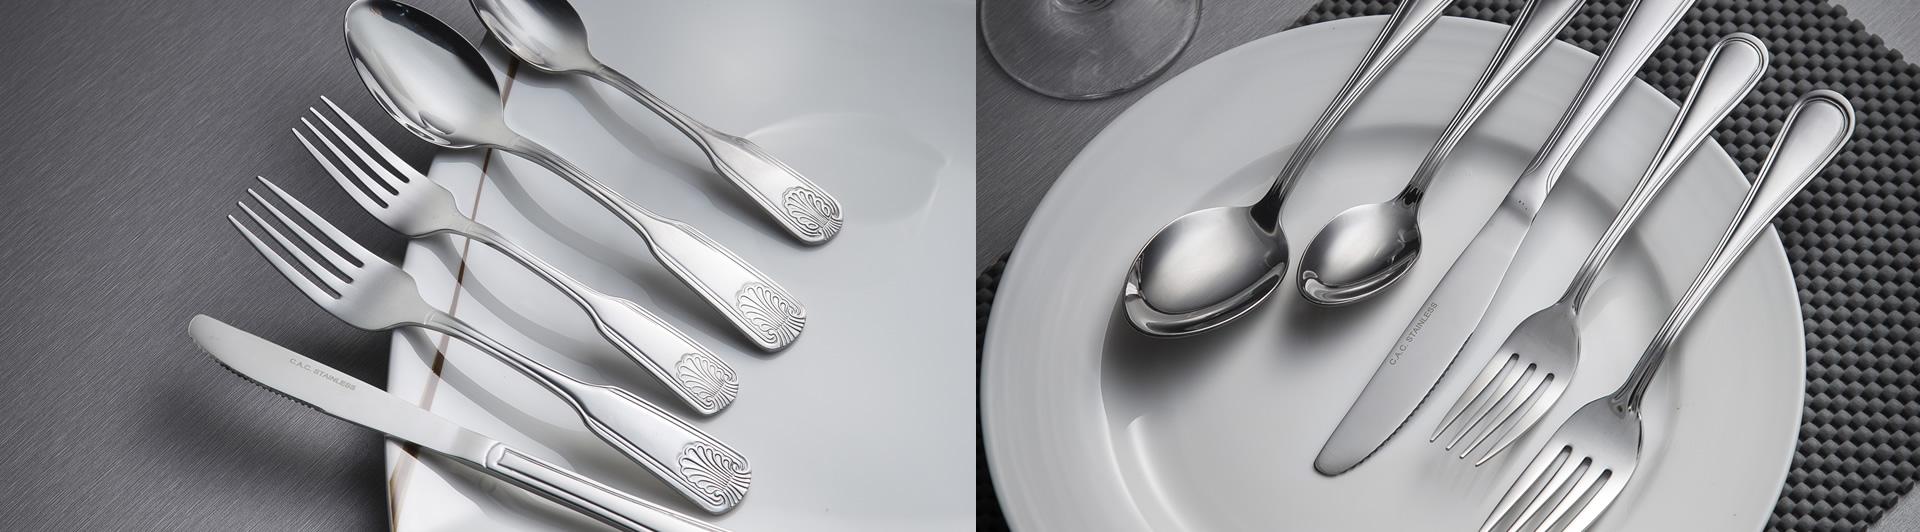 019357ae482e C.A.C. China -Dinnerware